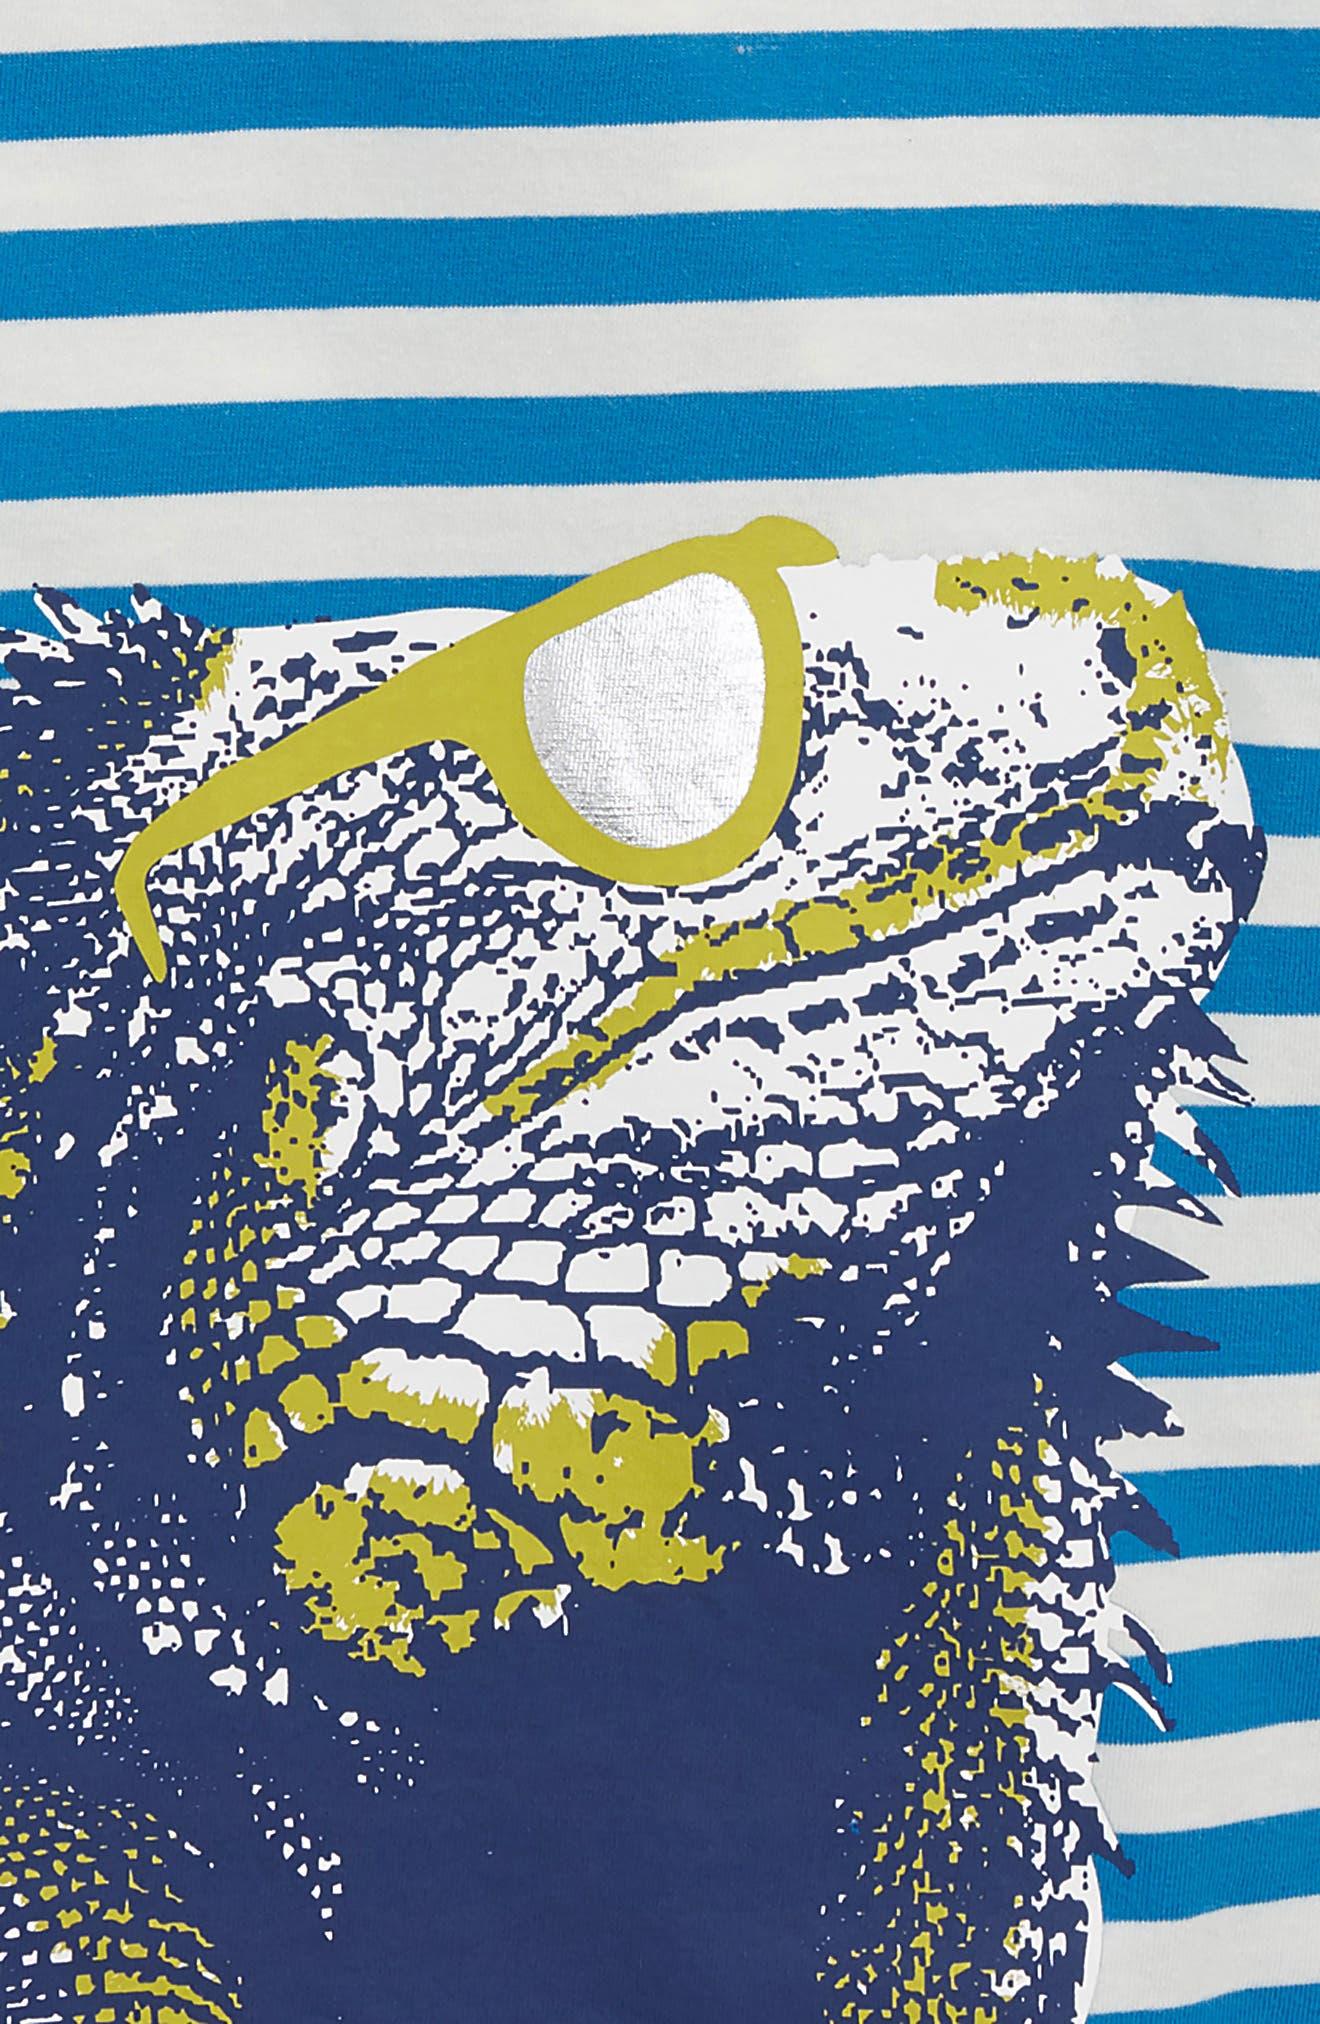 Arty Iguana T-Shirt,                             Alternate thumbnail 2, color,                             424